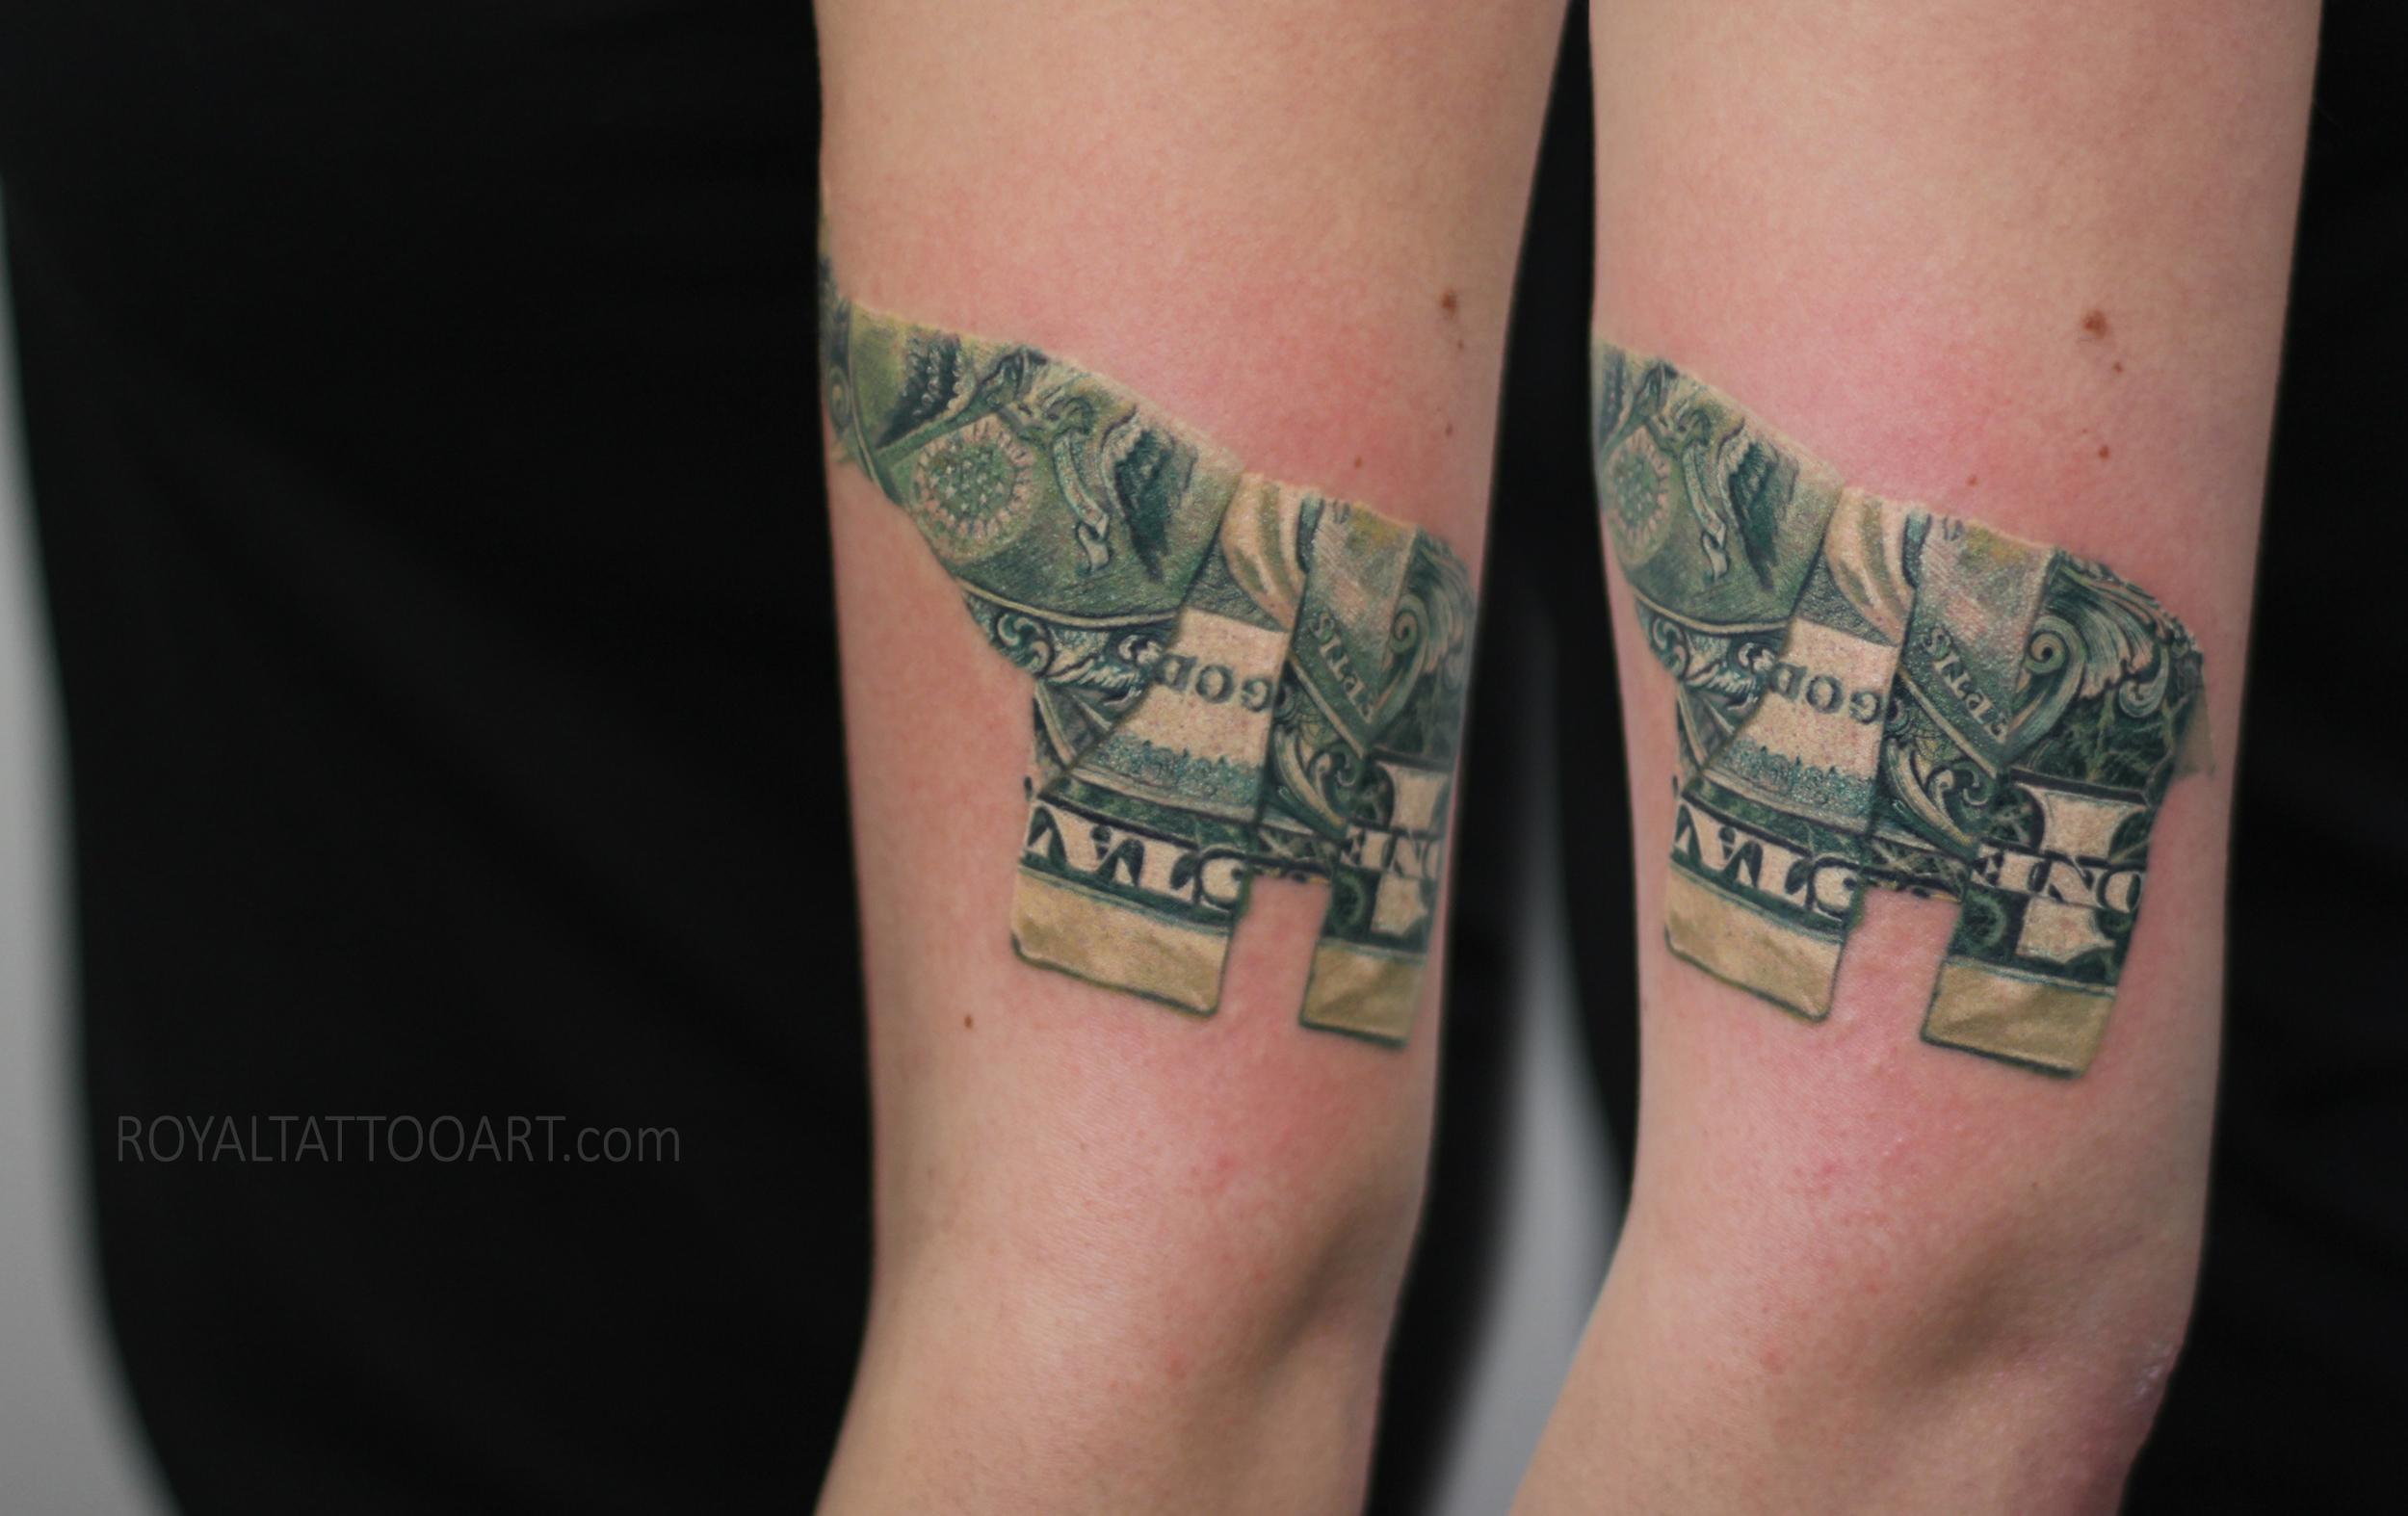 Elephant tattoo dollar bill realism realsitic hiper single needle nyc new york manhattan